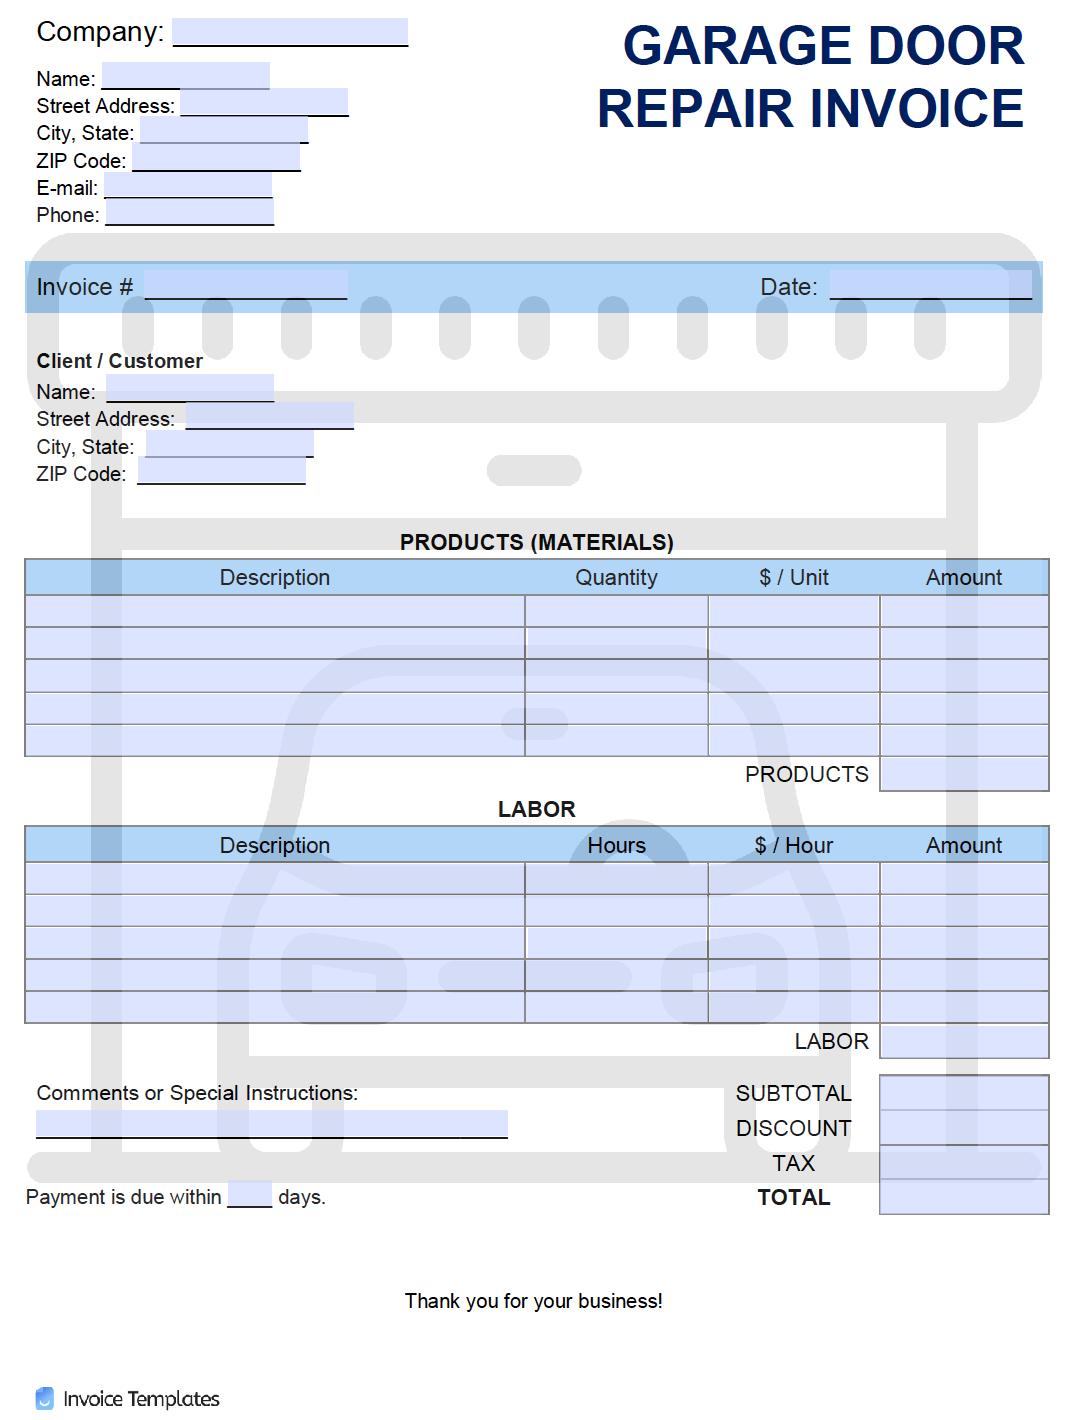 Free Garage Door Repair Invoice Template | PDF | WORD | EXCEL